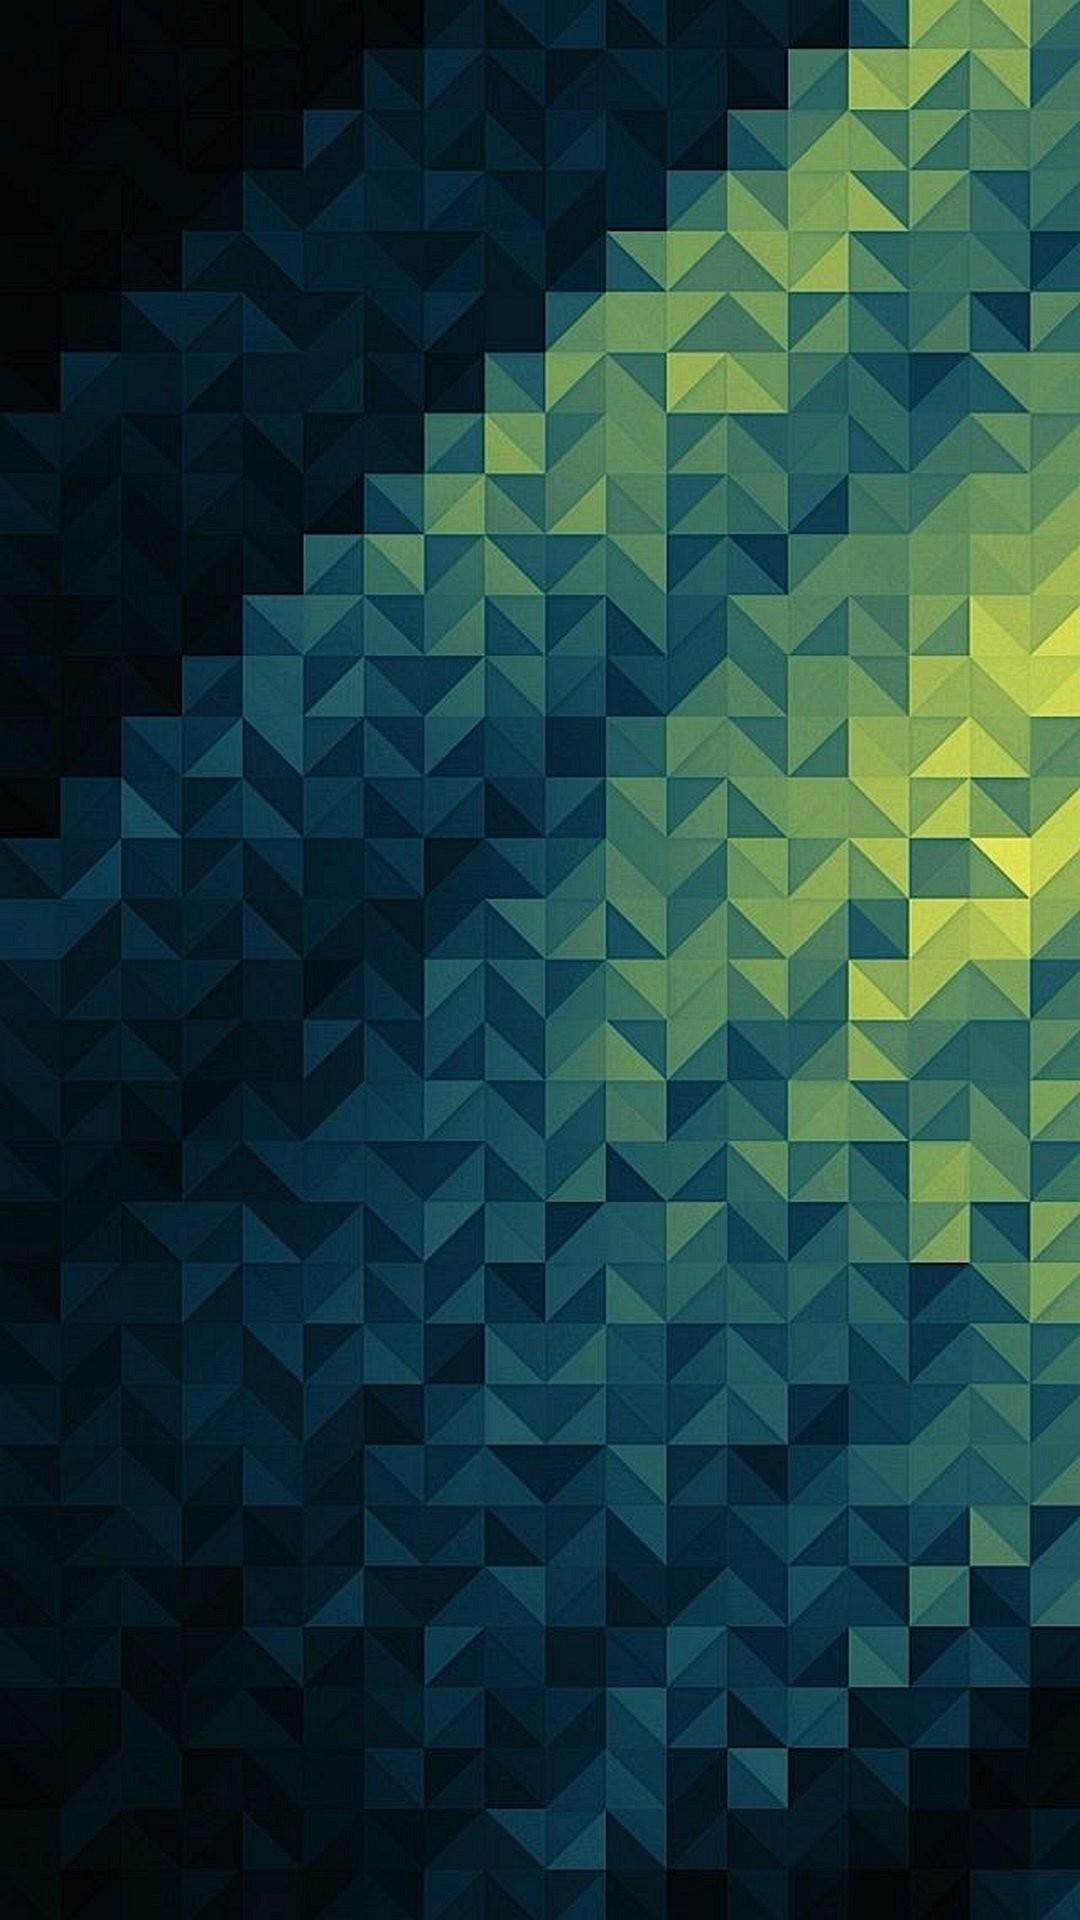 Geometric Iphone Wallpaper 77 Images